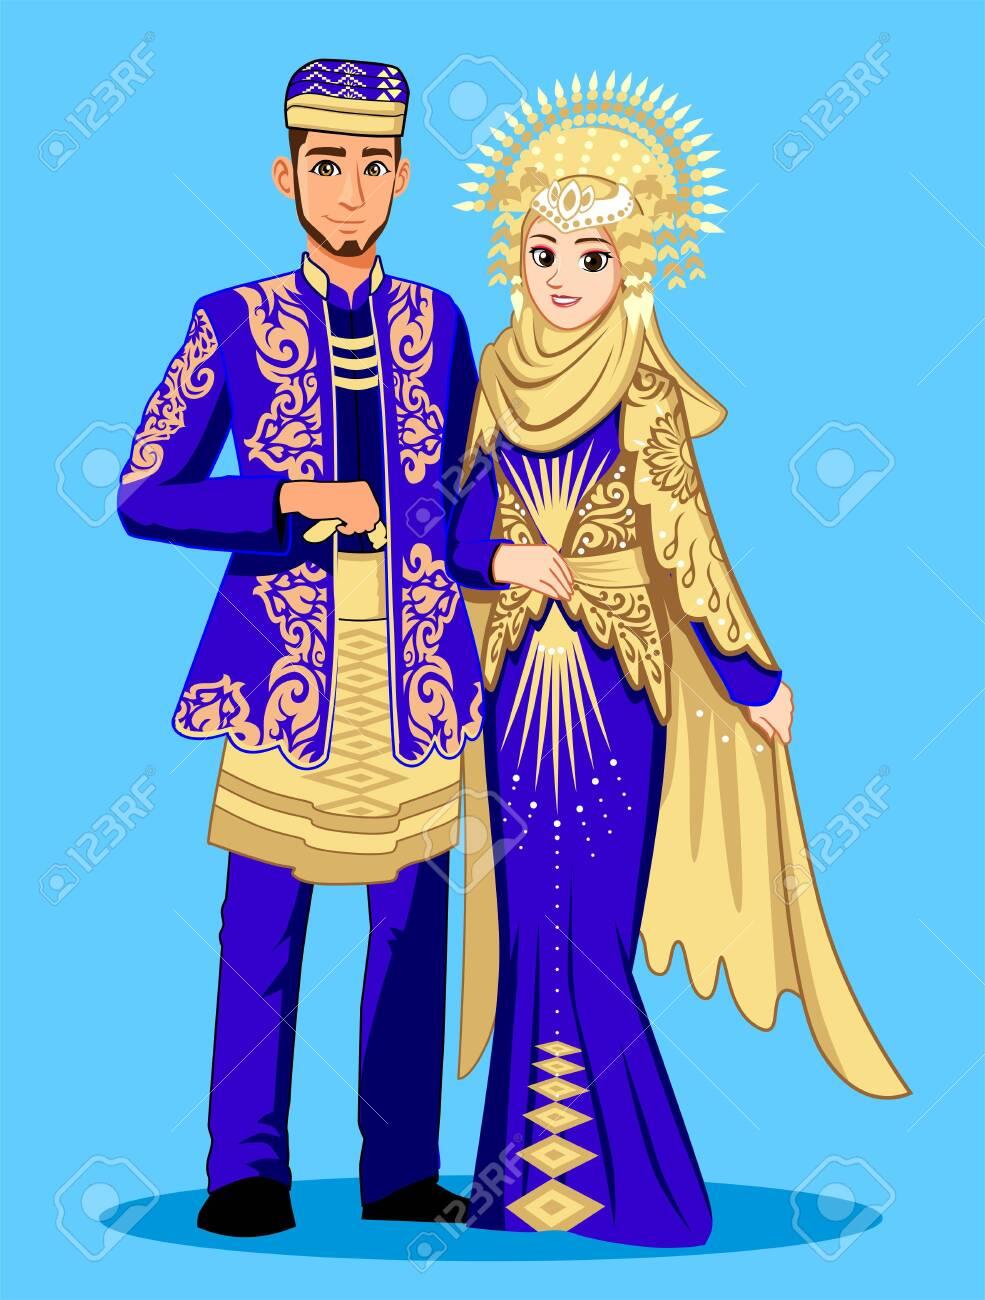 Pakaian Adat Vector : pakaian, vector, Minang, Padang, Muslim, Wedding, Royalty, Cliparts,, Vectors,, Stock, Illustration., Image, 128177418.